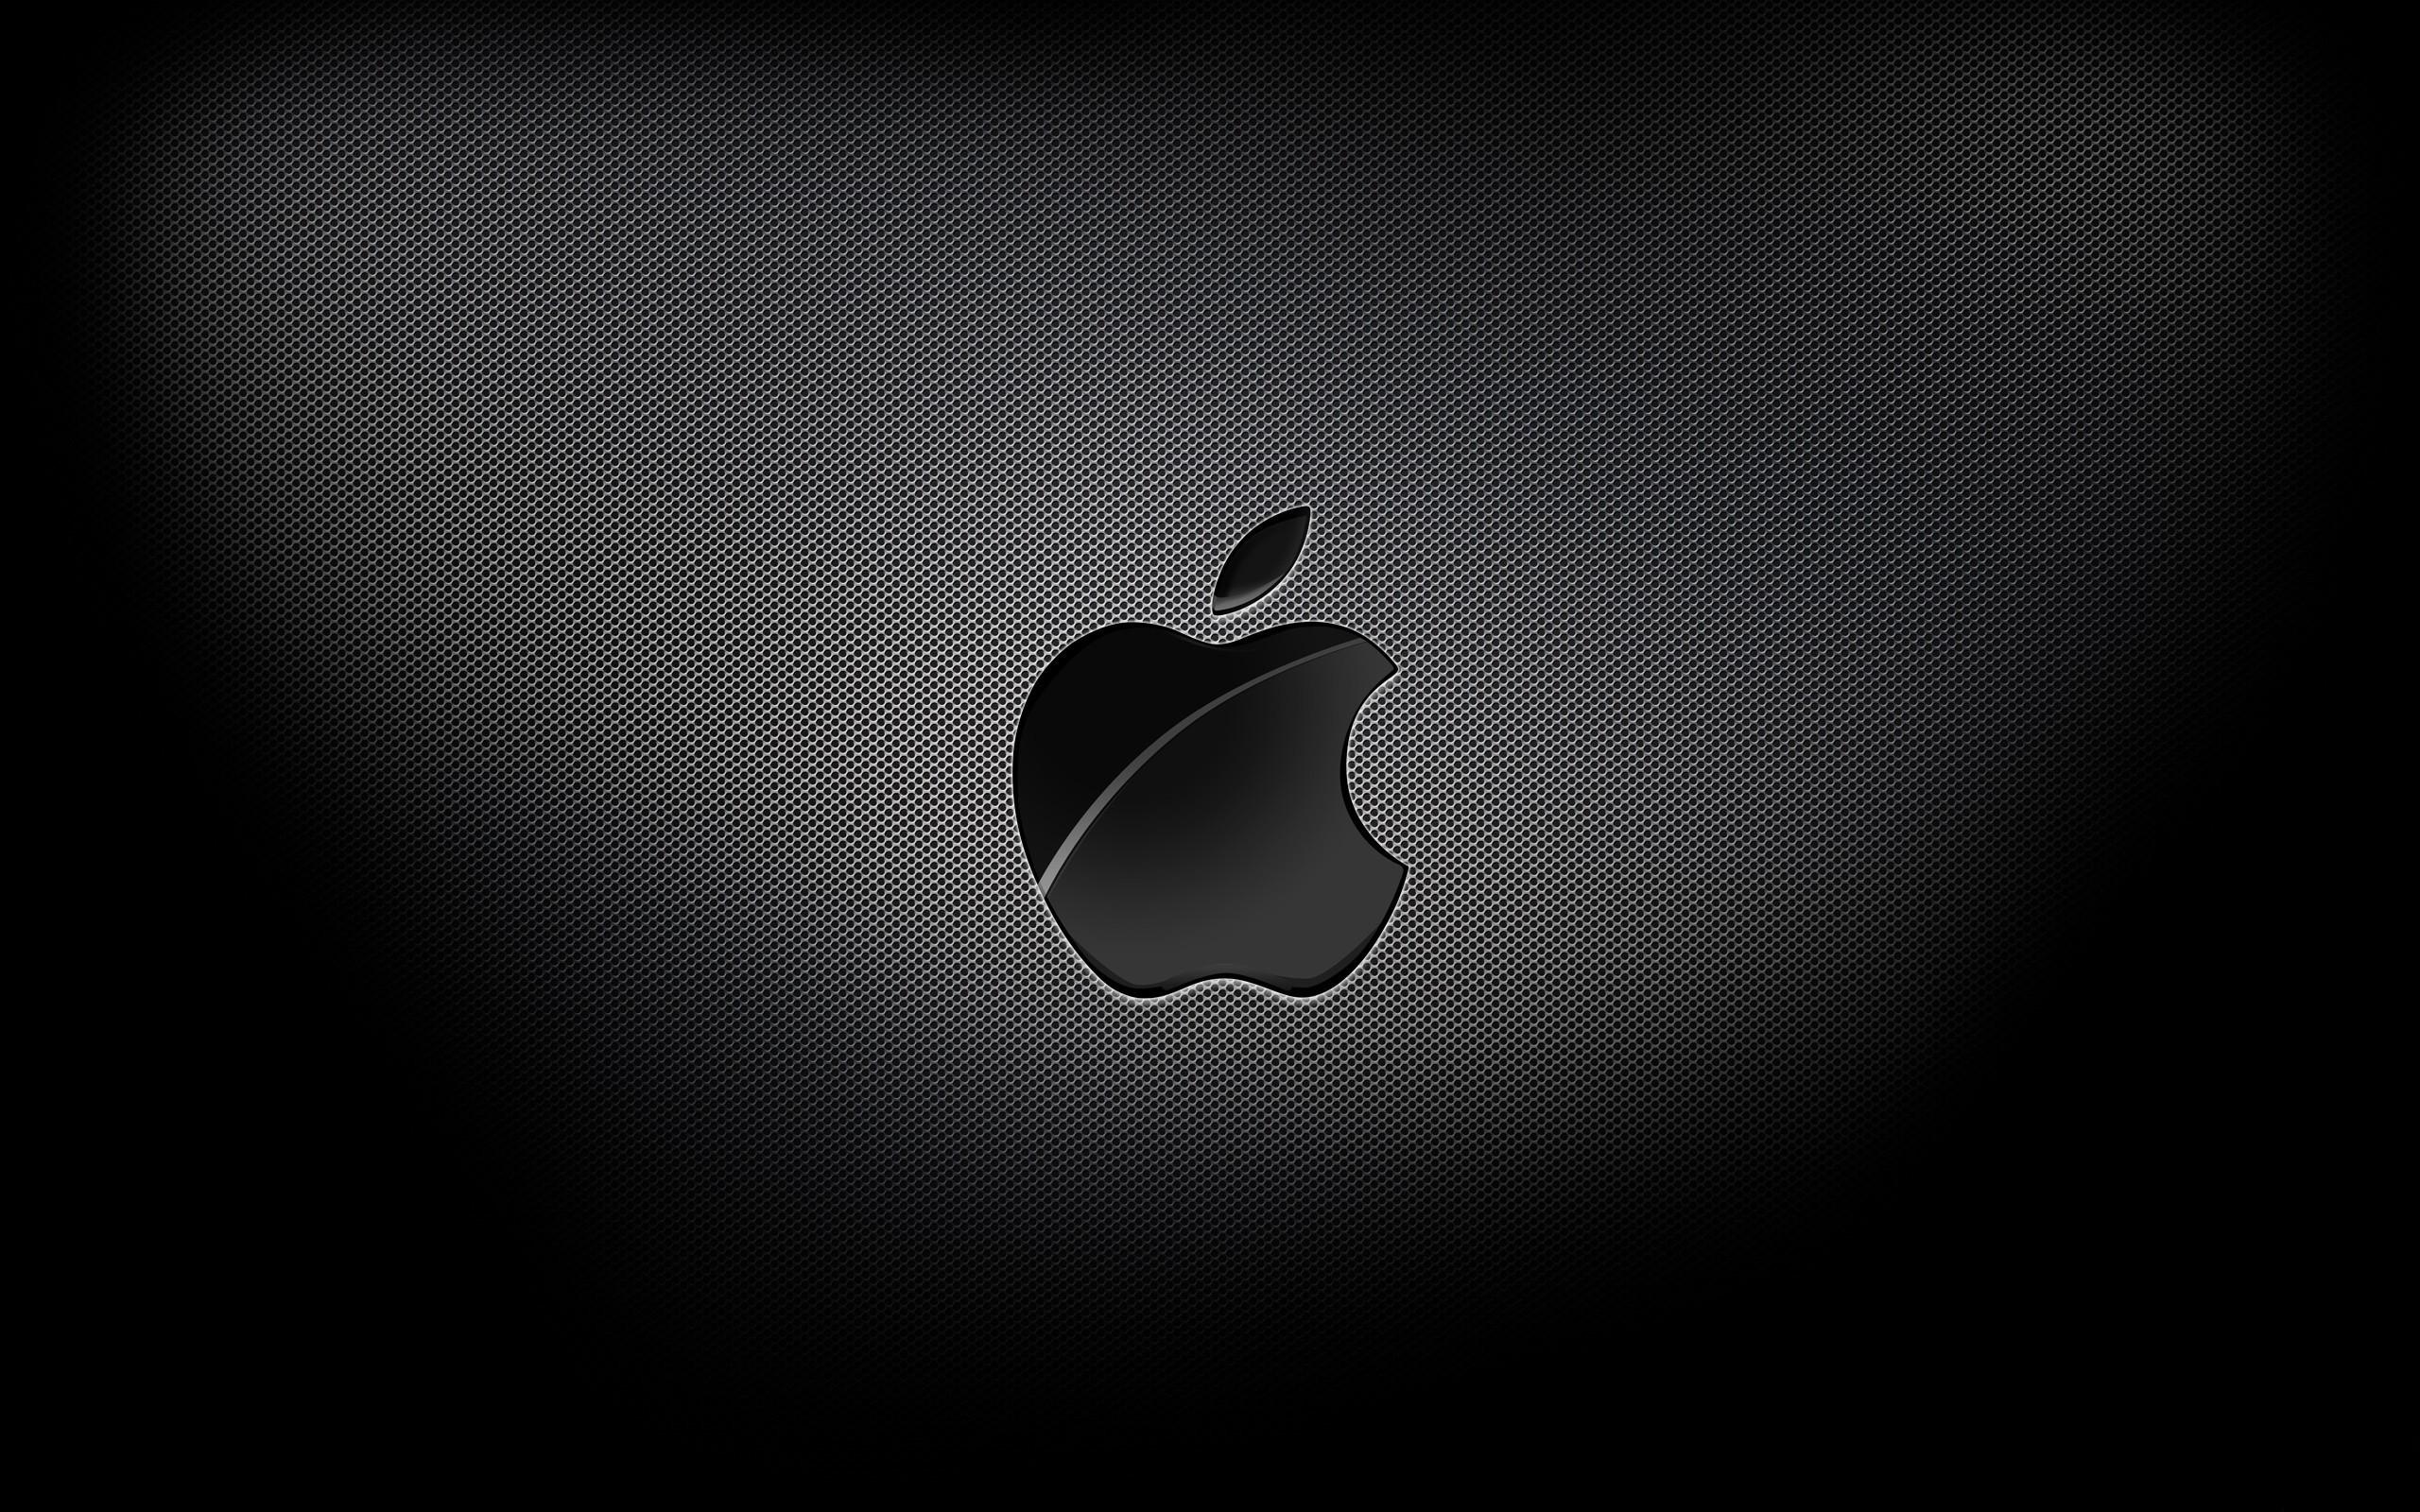 Download Macbook Air Wallpaper Hd: … Black Background Mac Wallpaper .